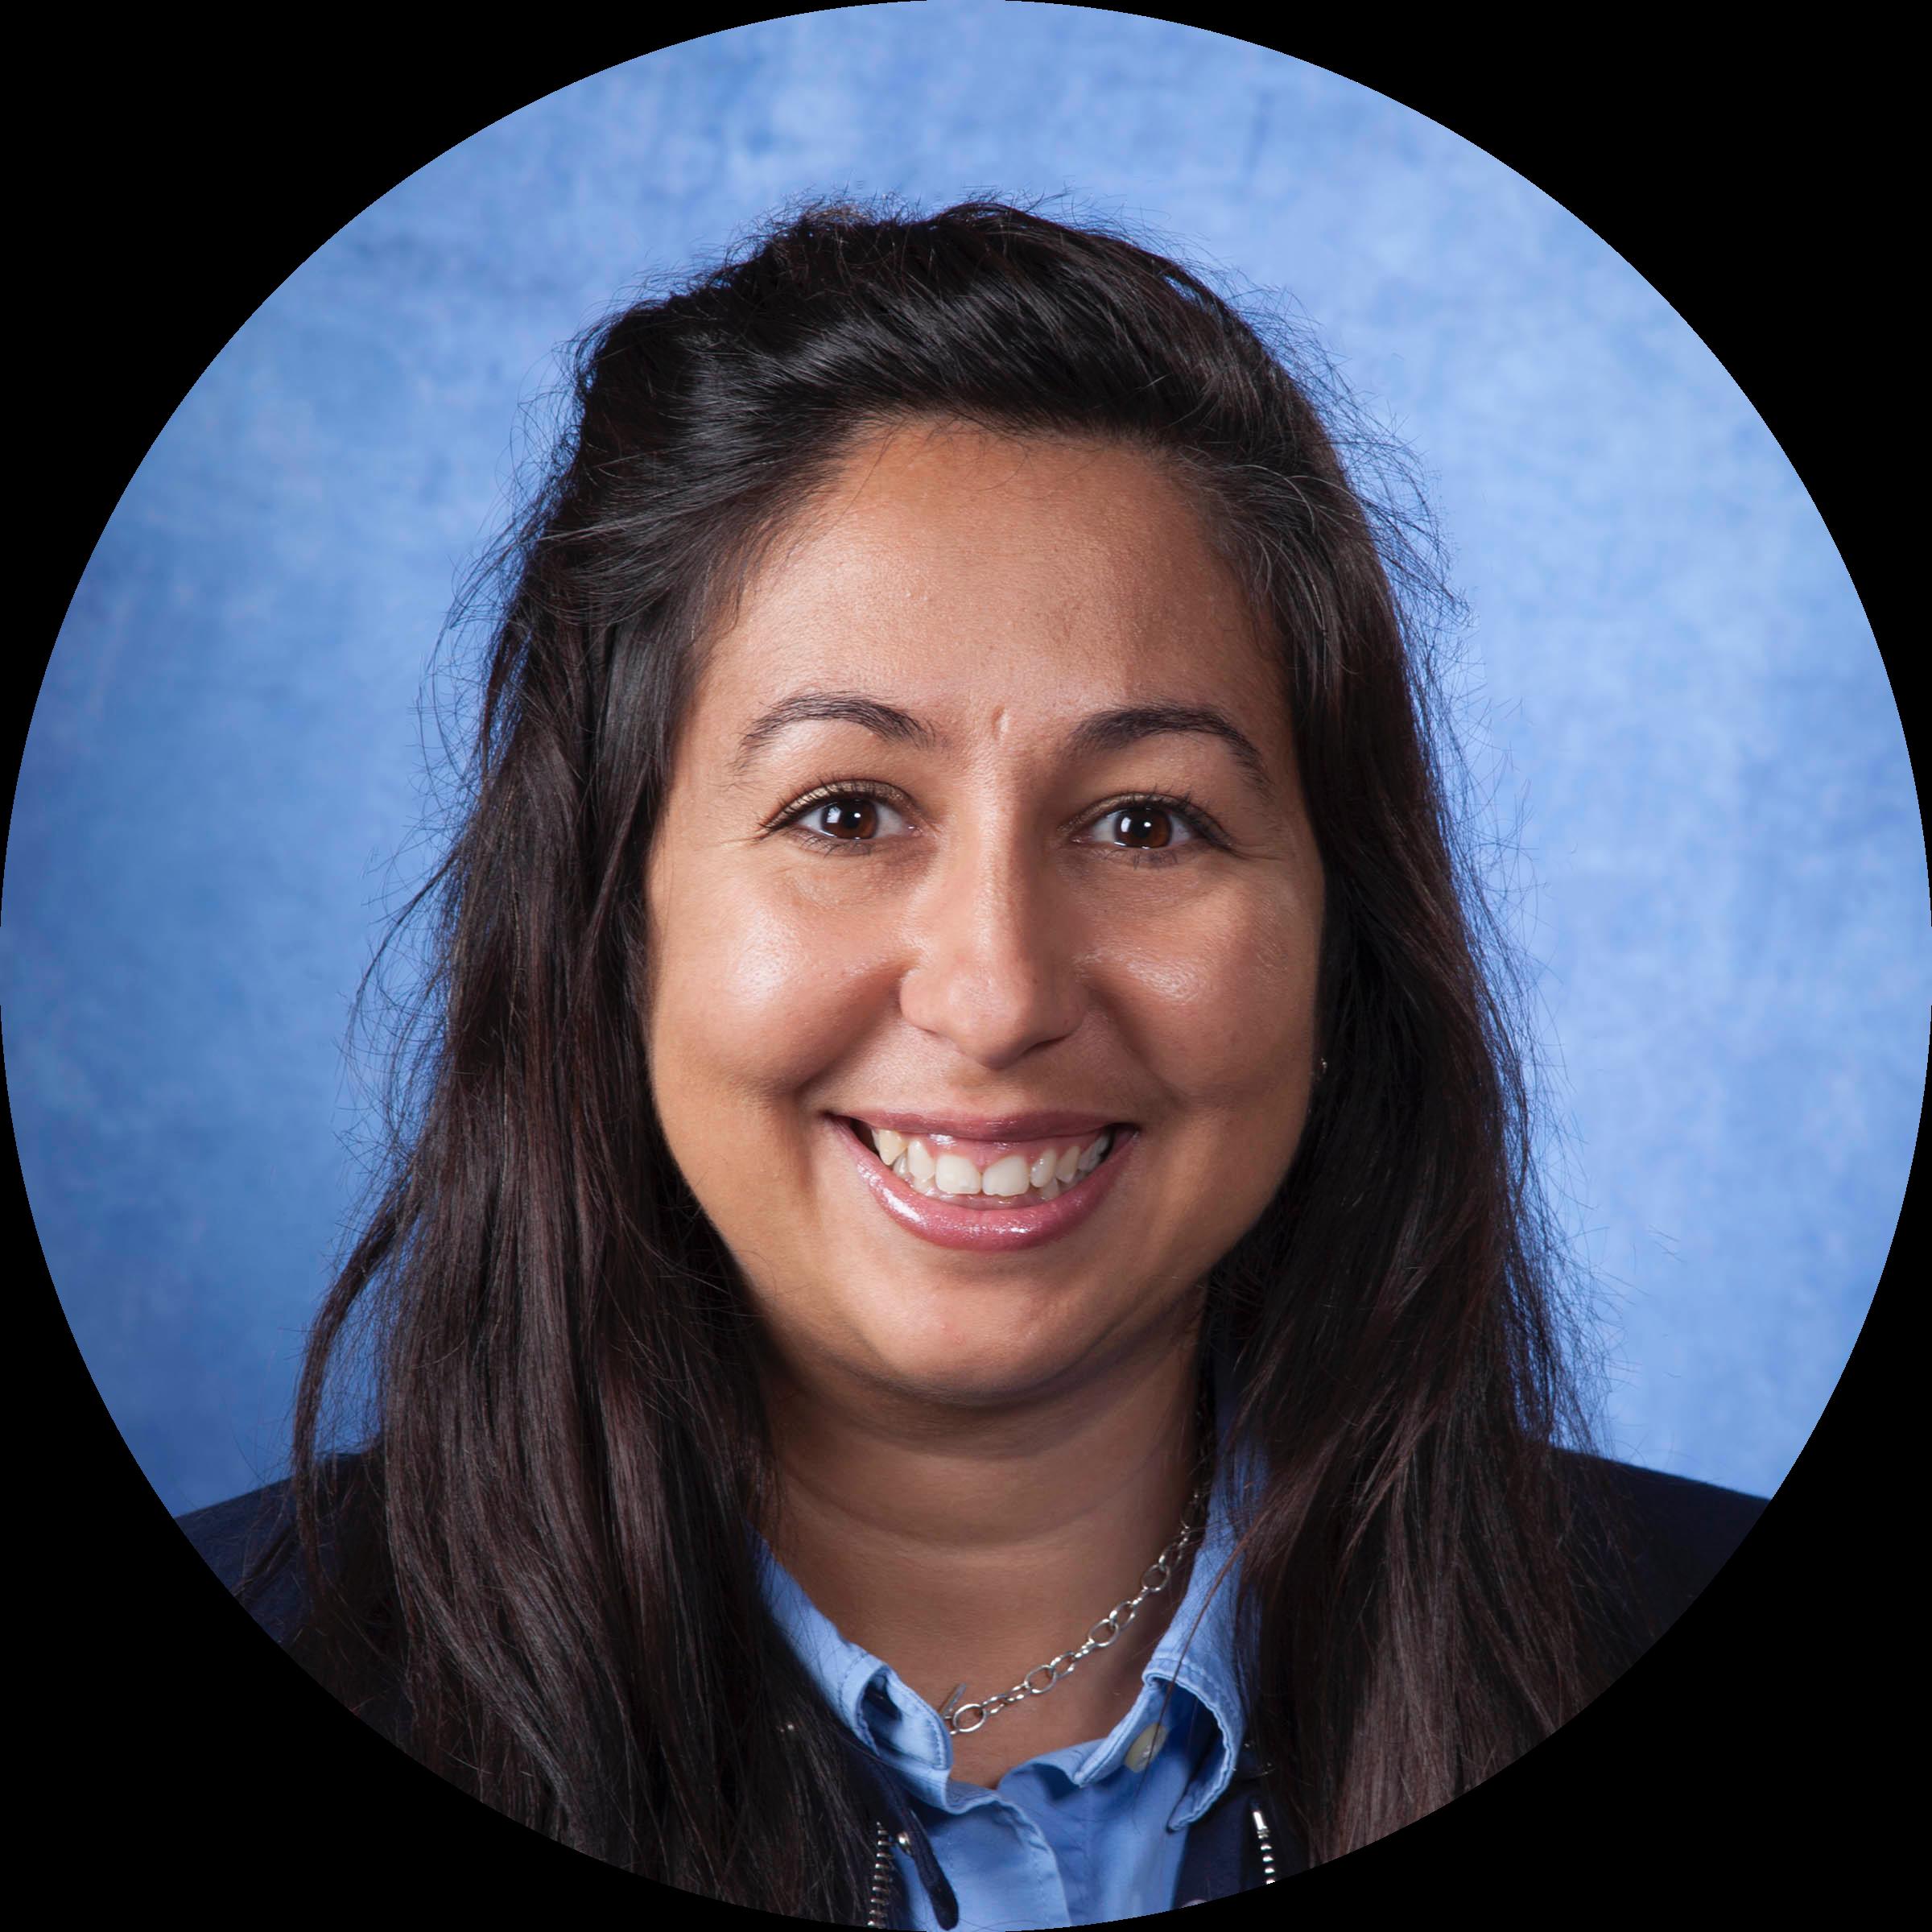 Nadia Ivanova-Pfenning, Human Resources Manager with Coconino County, Arizona